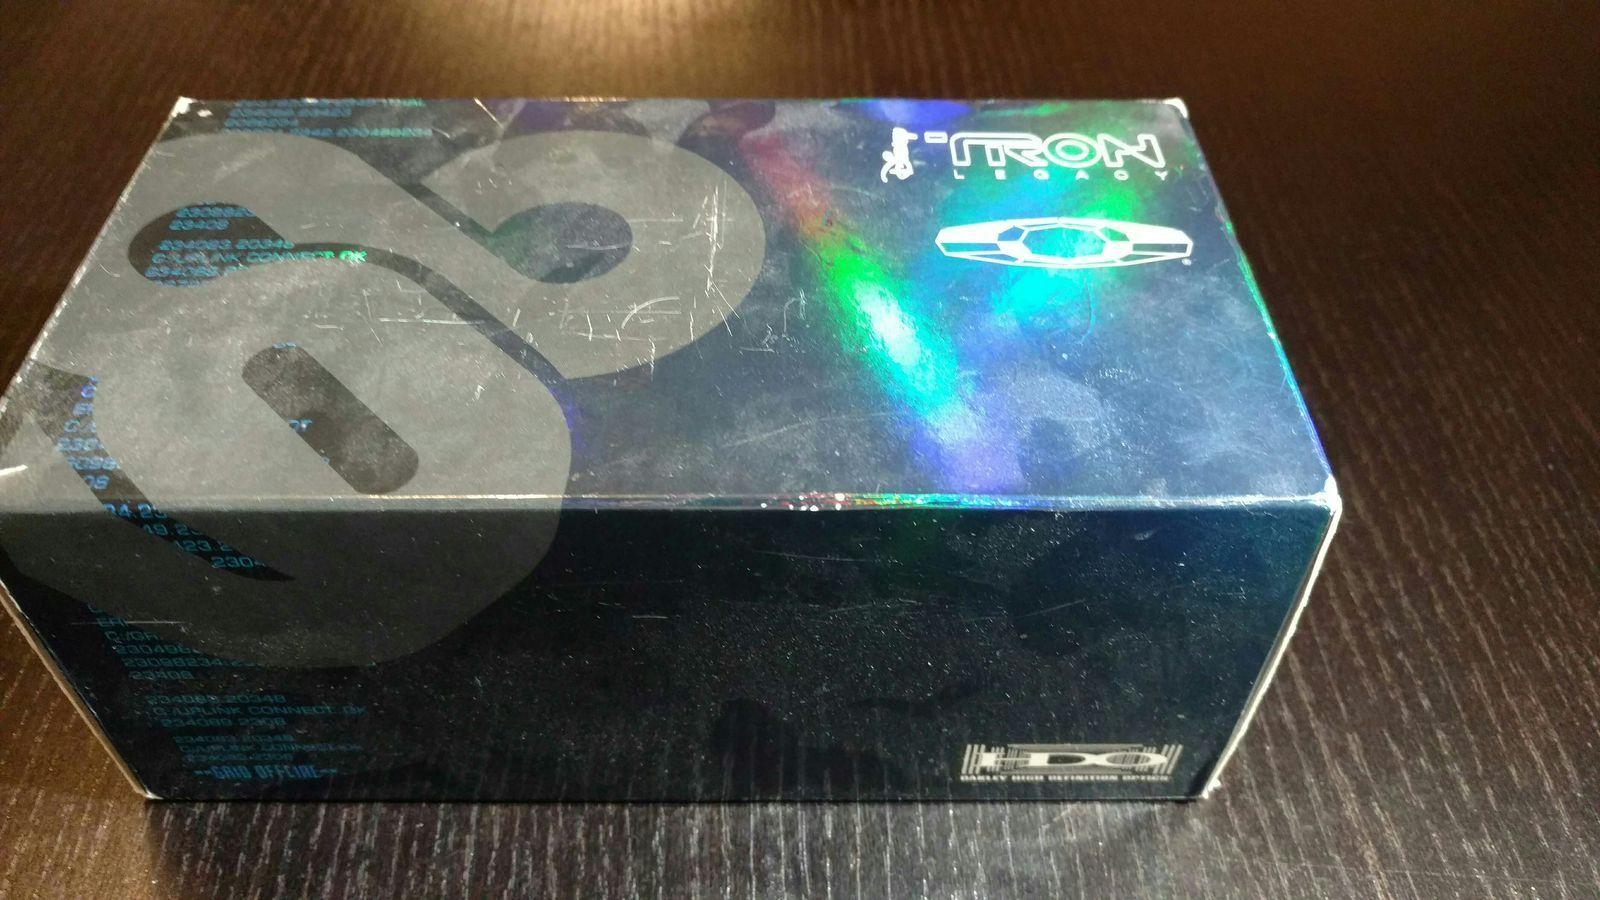 Tron Pitboss 1 - b13b05efdcd64b29544ba6303ed34aed.jpg